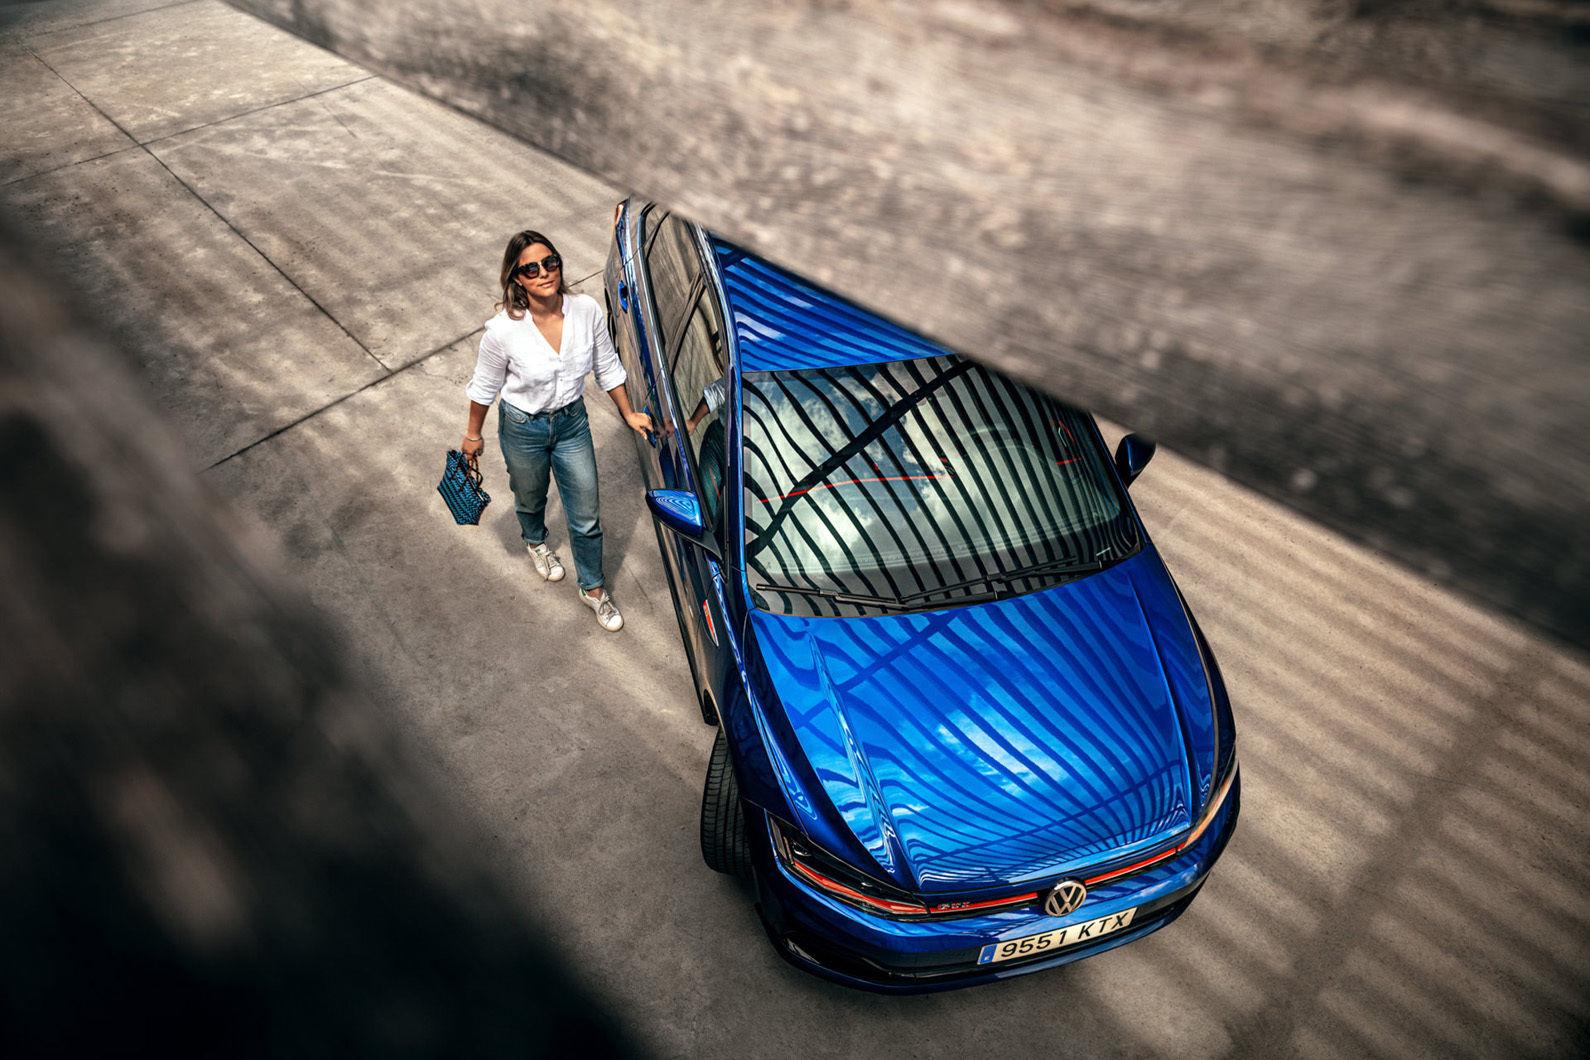 GEORG ROSKE C/O TOBIAS BOSCH FOTOMANAGEMENT FOTOGRAFIERT SOCIAL MEDIA KAMPAGNE FÜR DEN NEUEN VW POLO GTi AUF MALLORCA